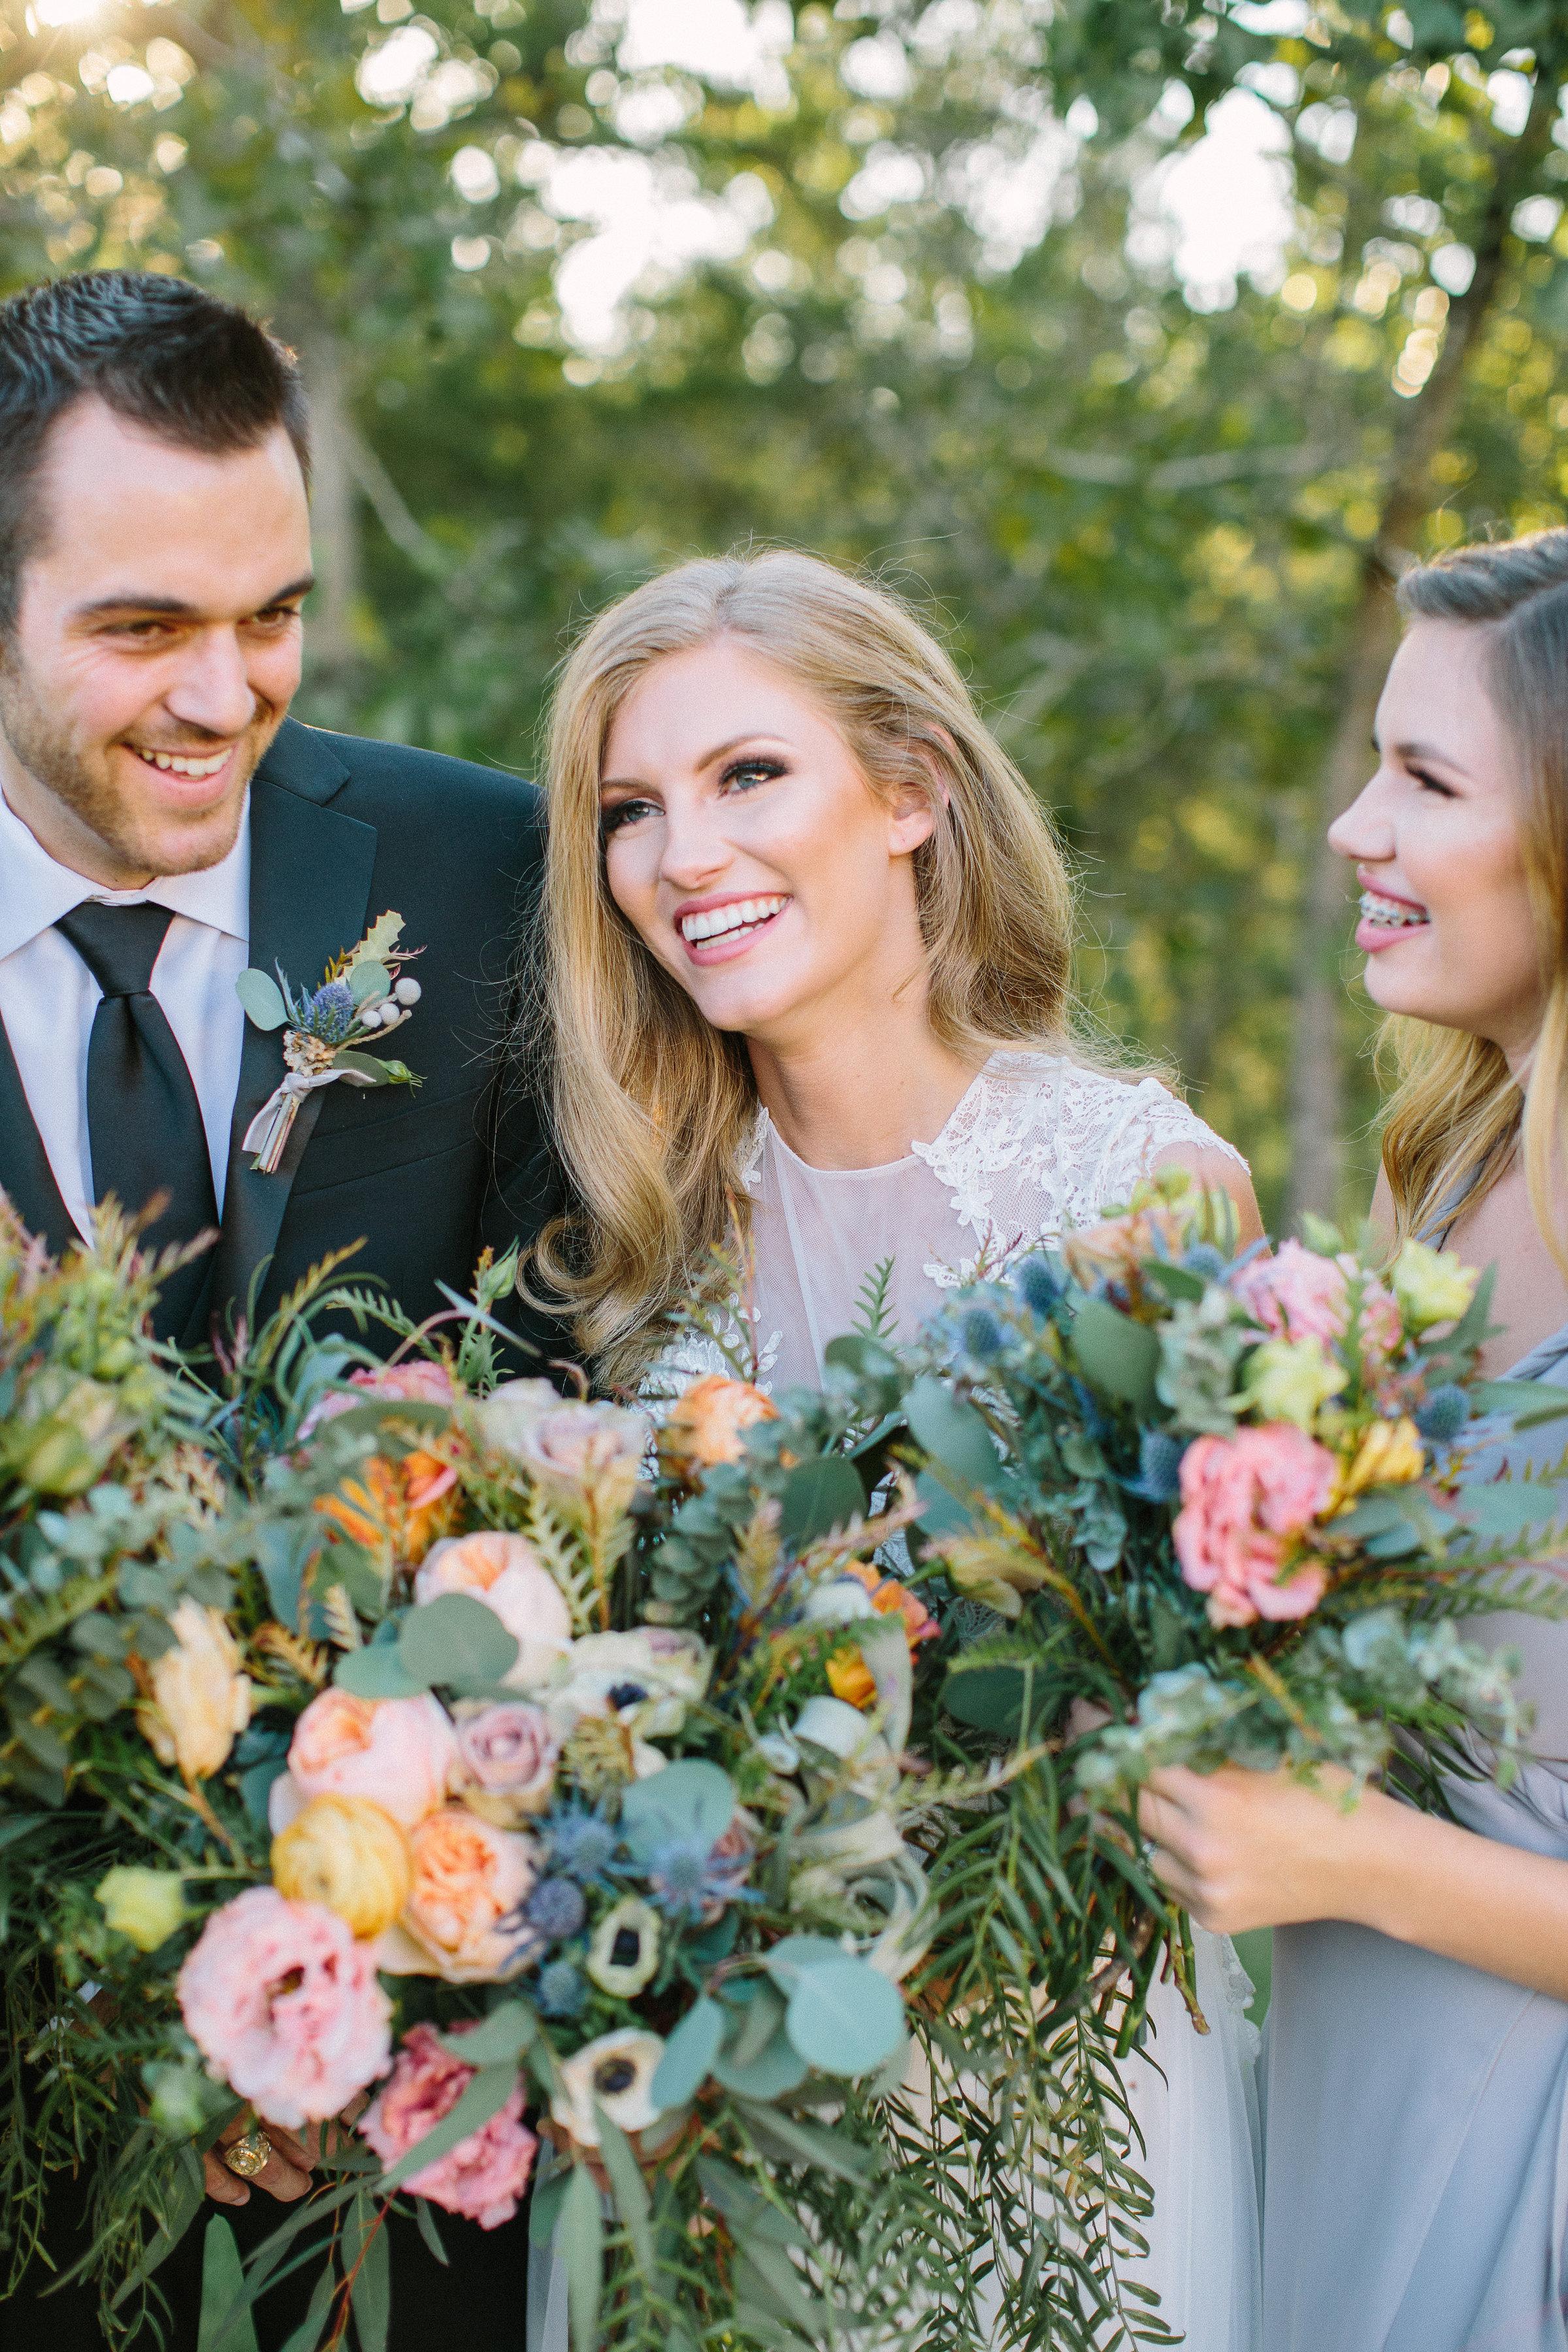 Ellen-Ashton-Photography-Peach-Creek-Ranch-Weddings-Wed-and-Prosper252